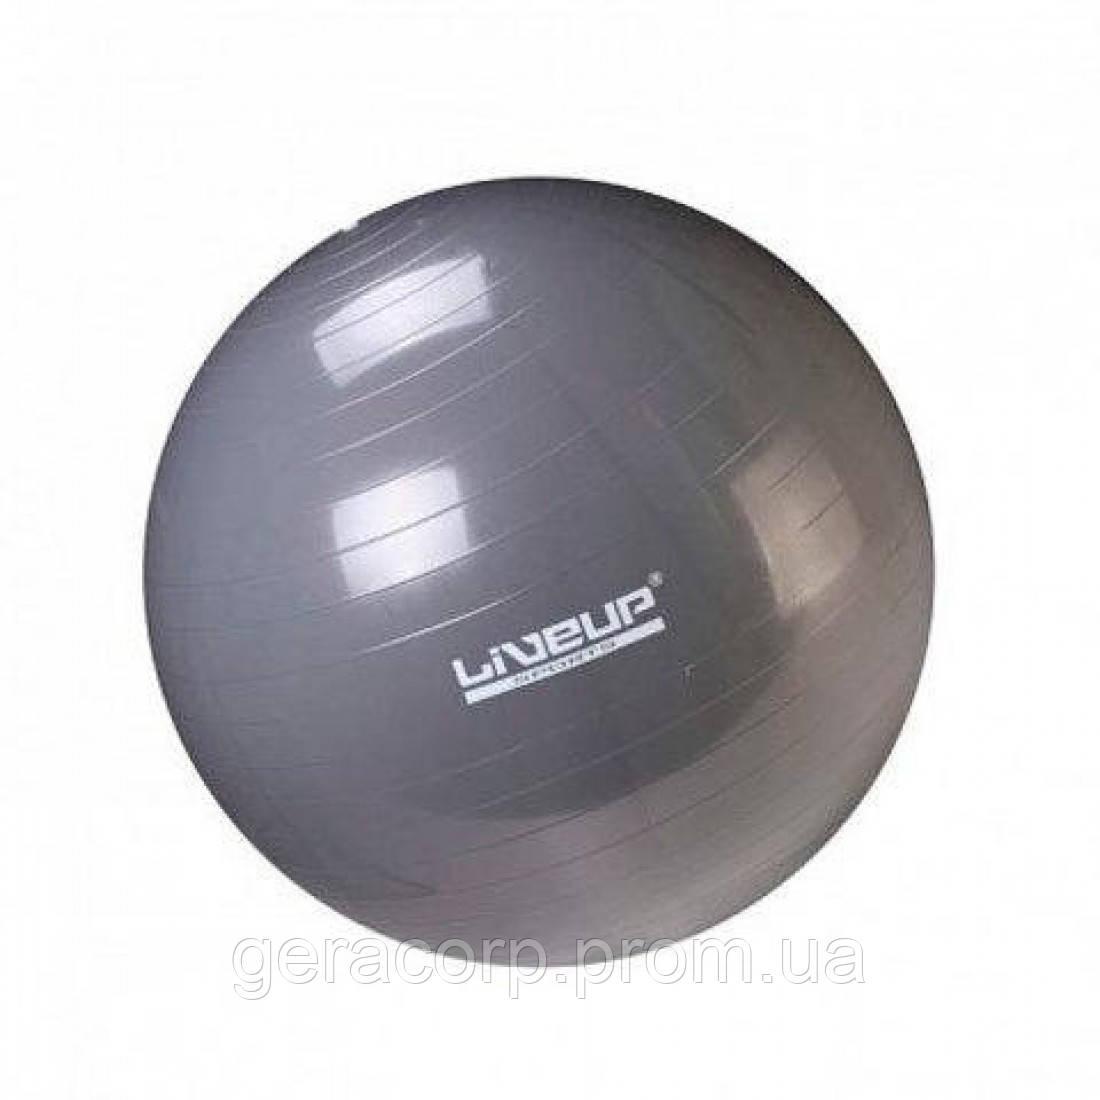 Фитбол GYM BALL 75см LS3221-75g